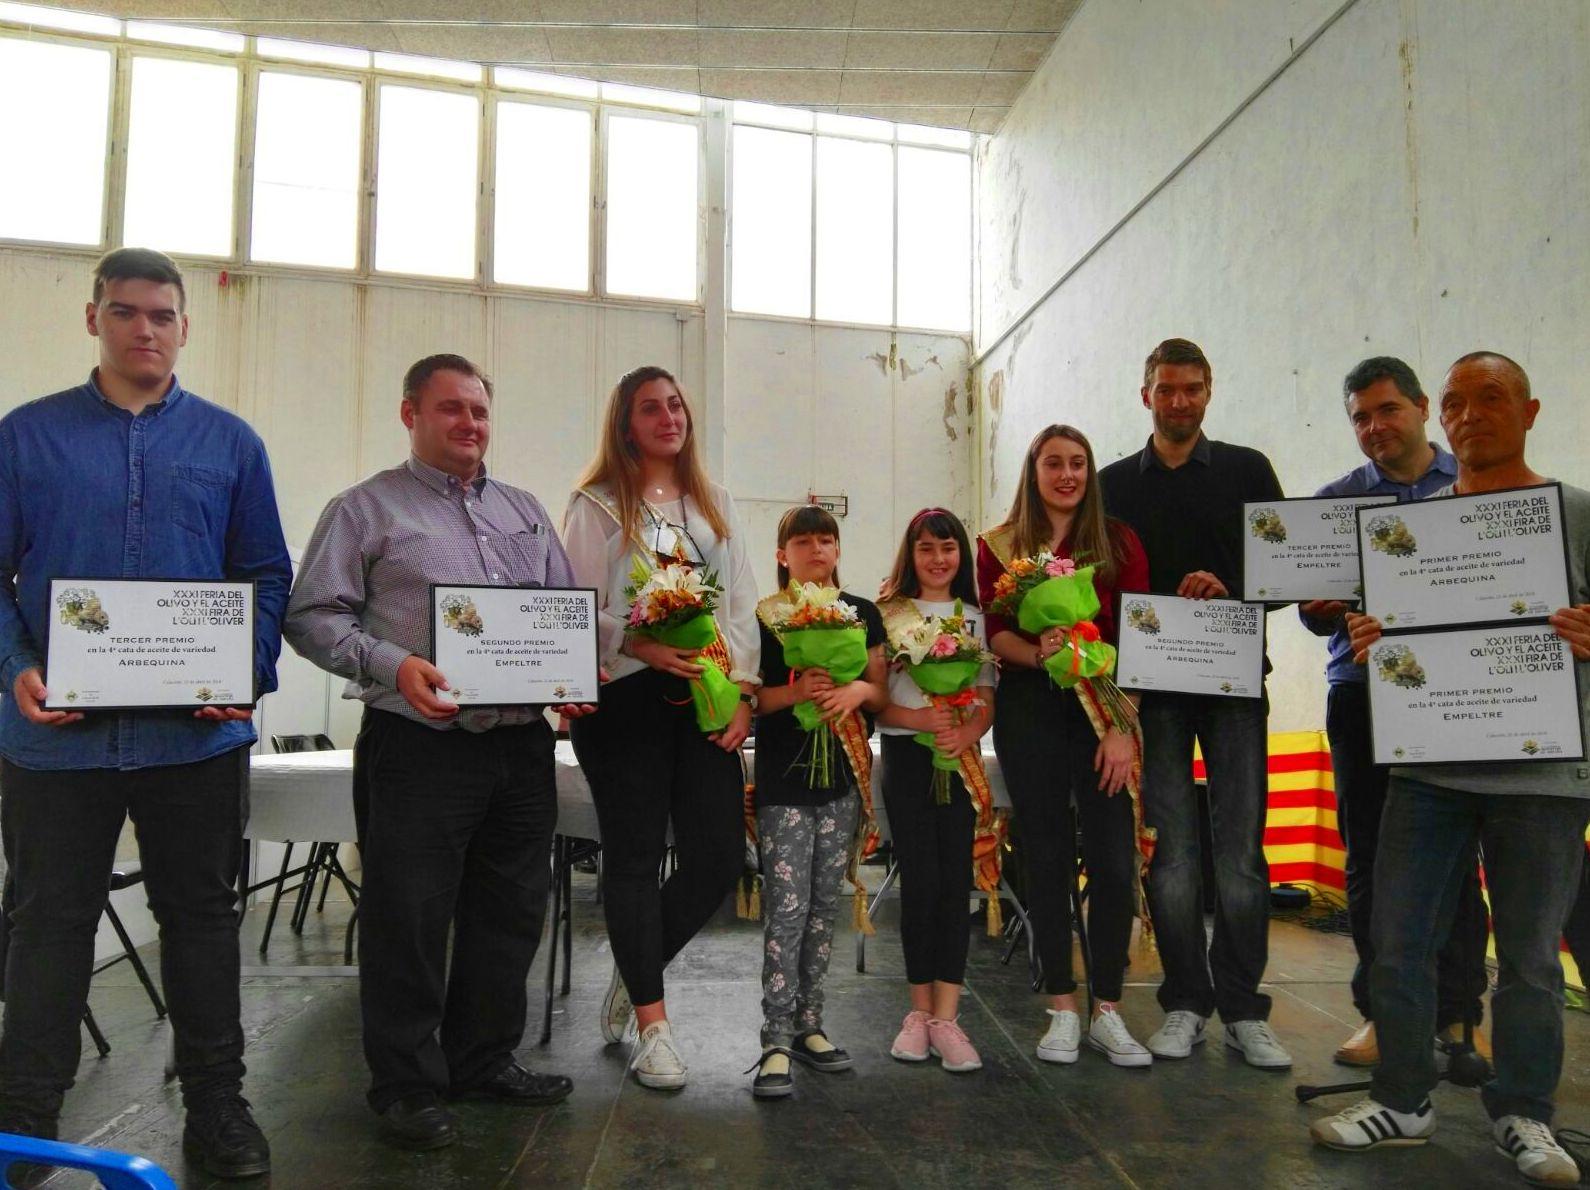 Foto cedida por www.lacomarca.net